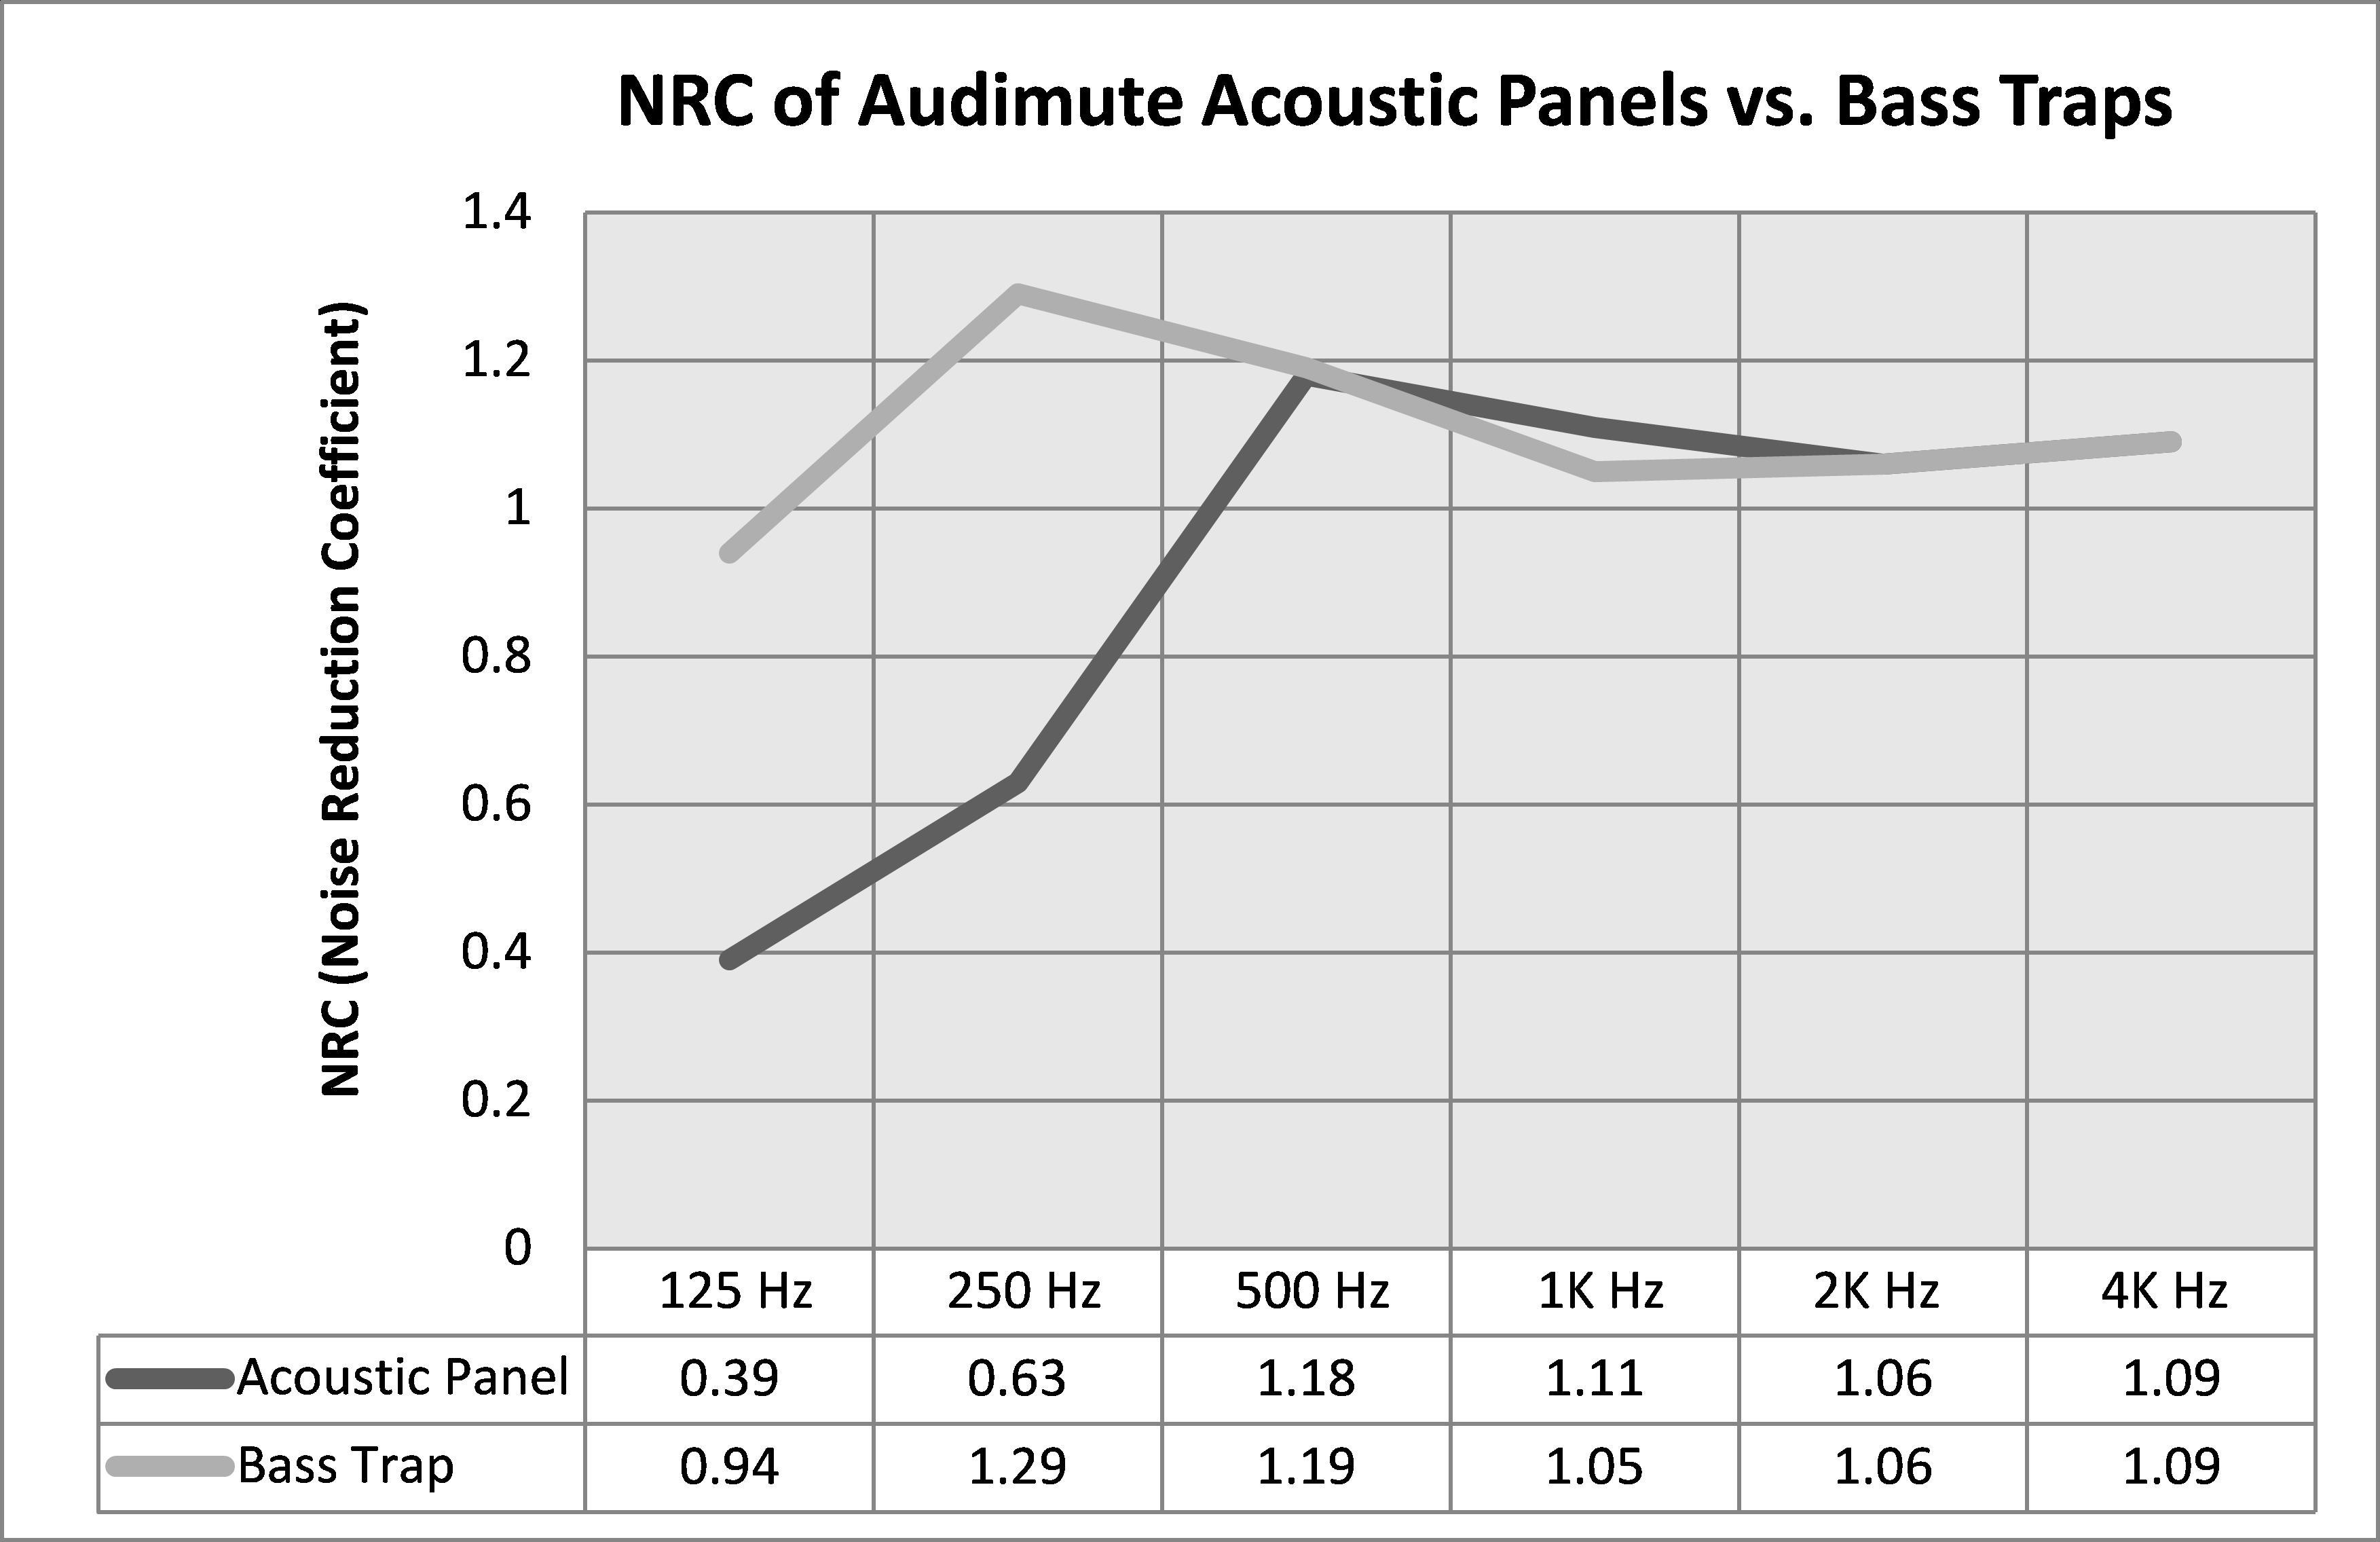 NRC of Audimute Acoustic Panels vs. Bass Traps